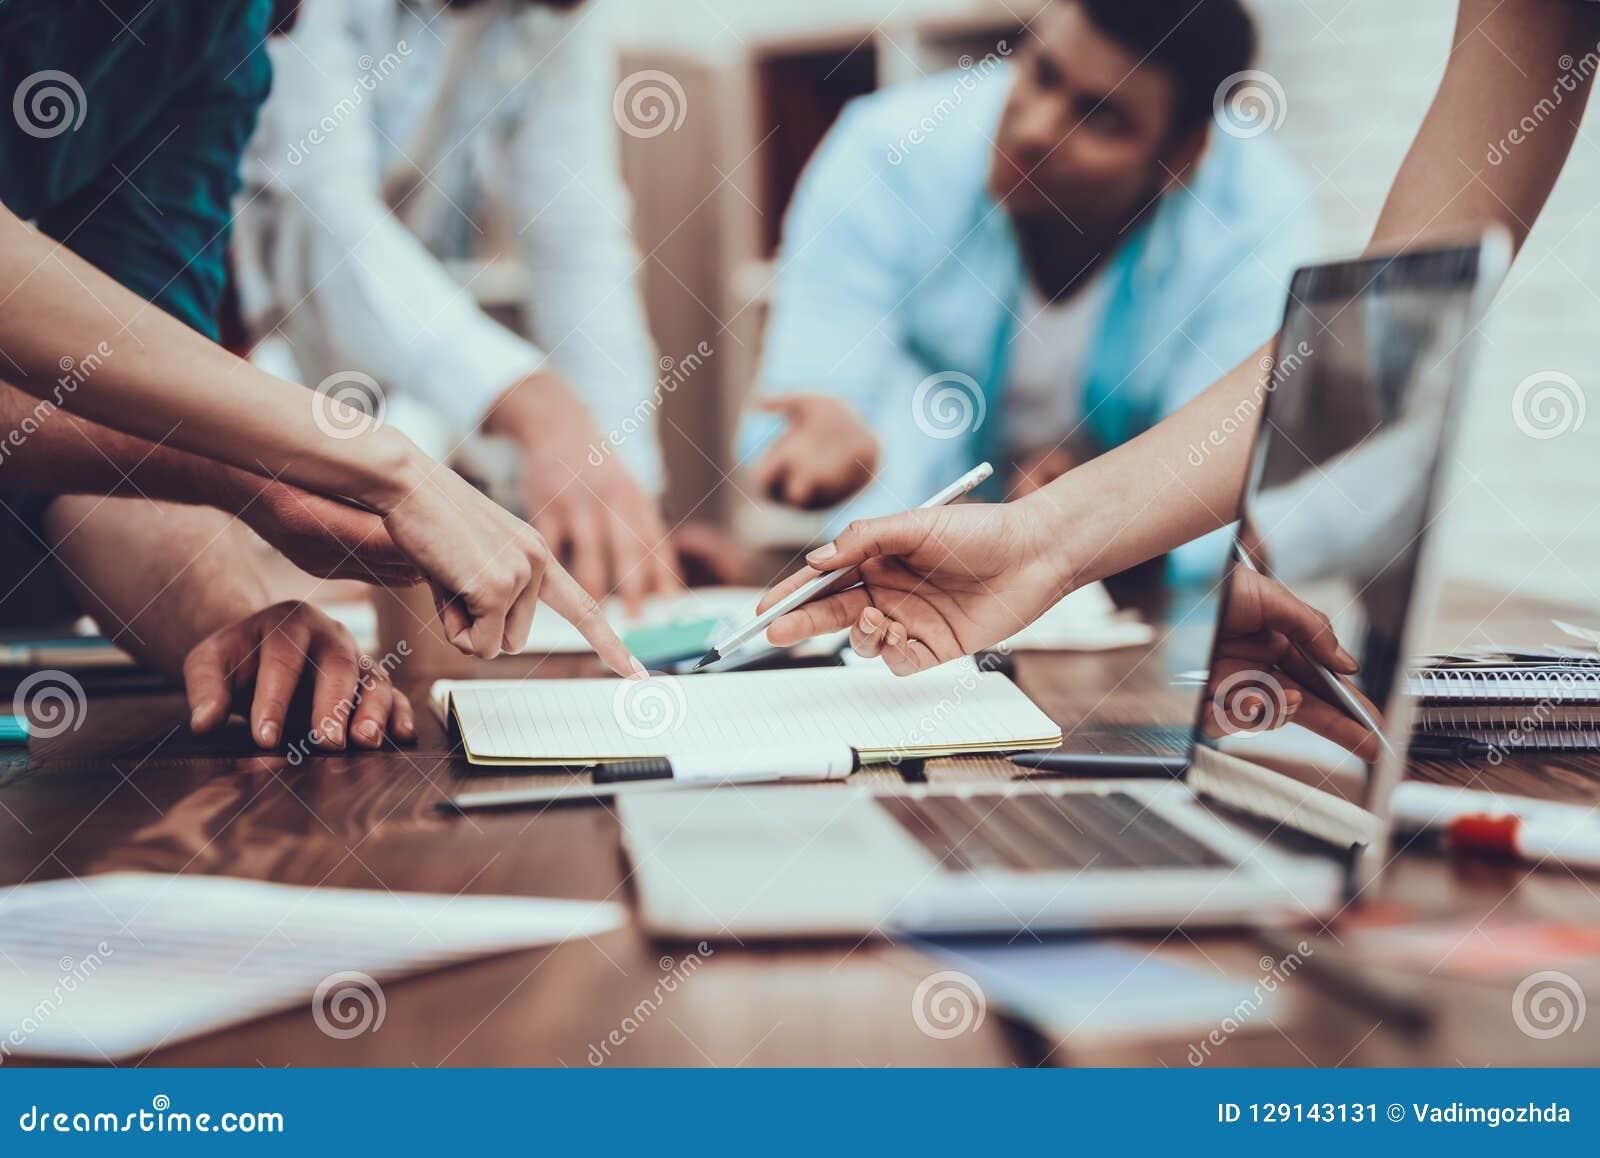 Project. Teamwork. Computers. Laptop. Design.